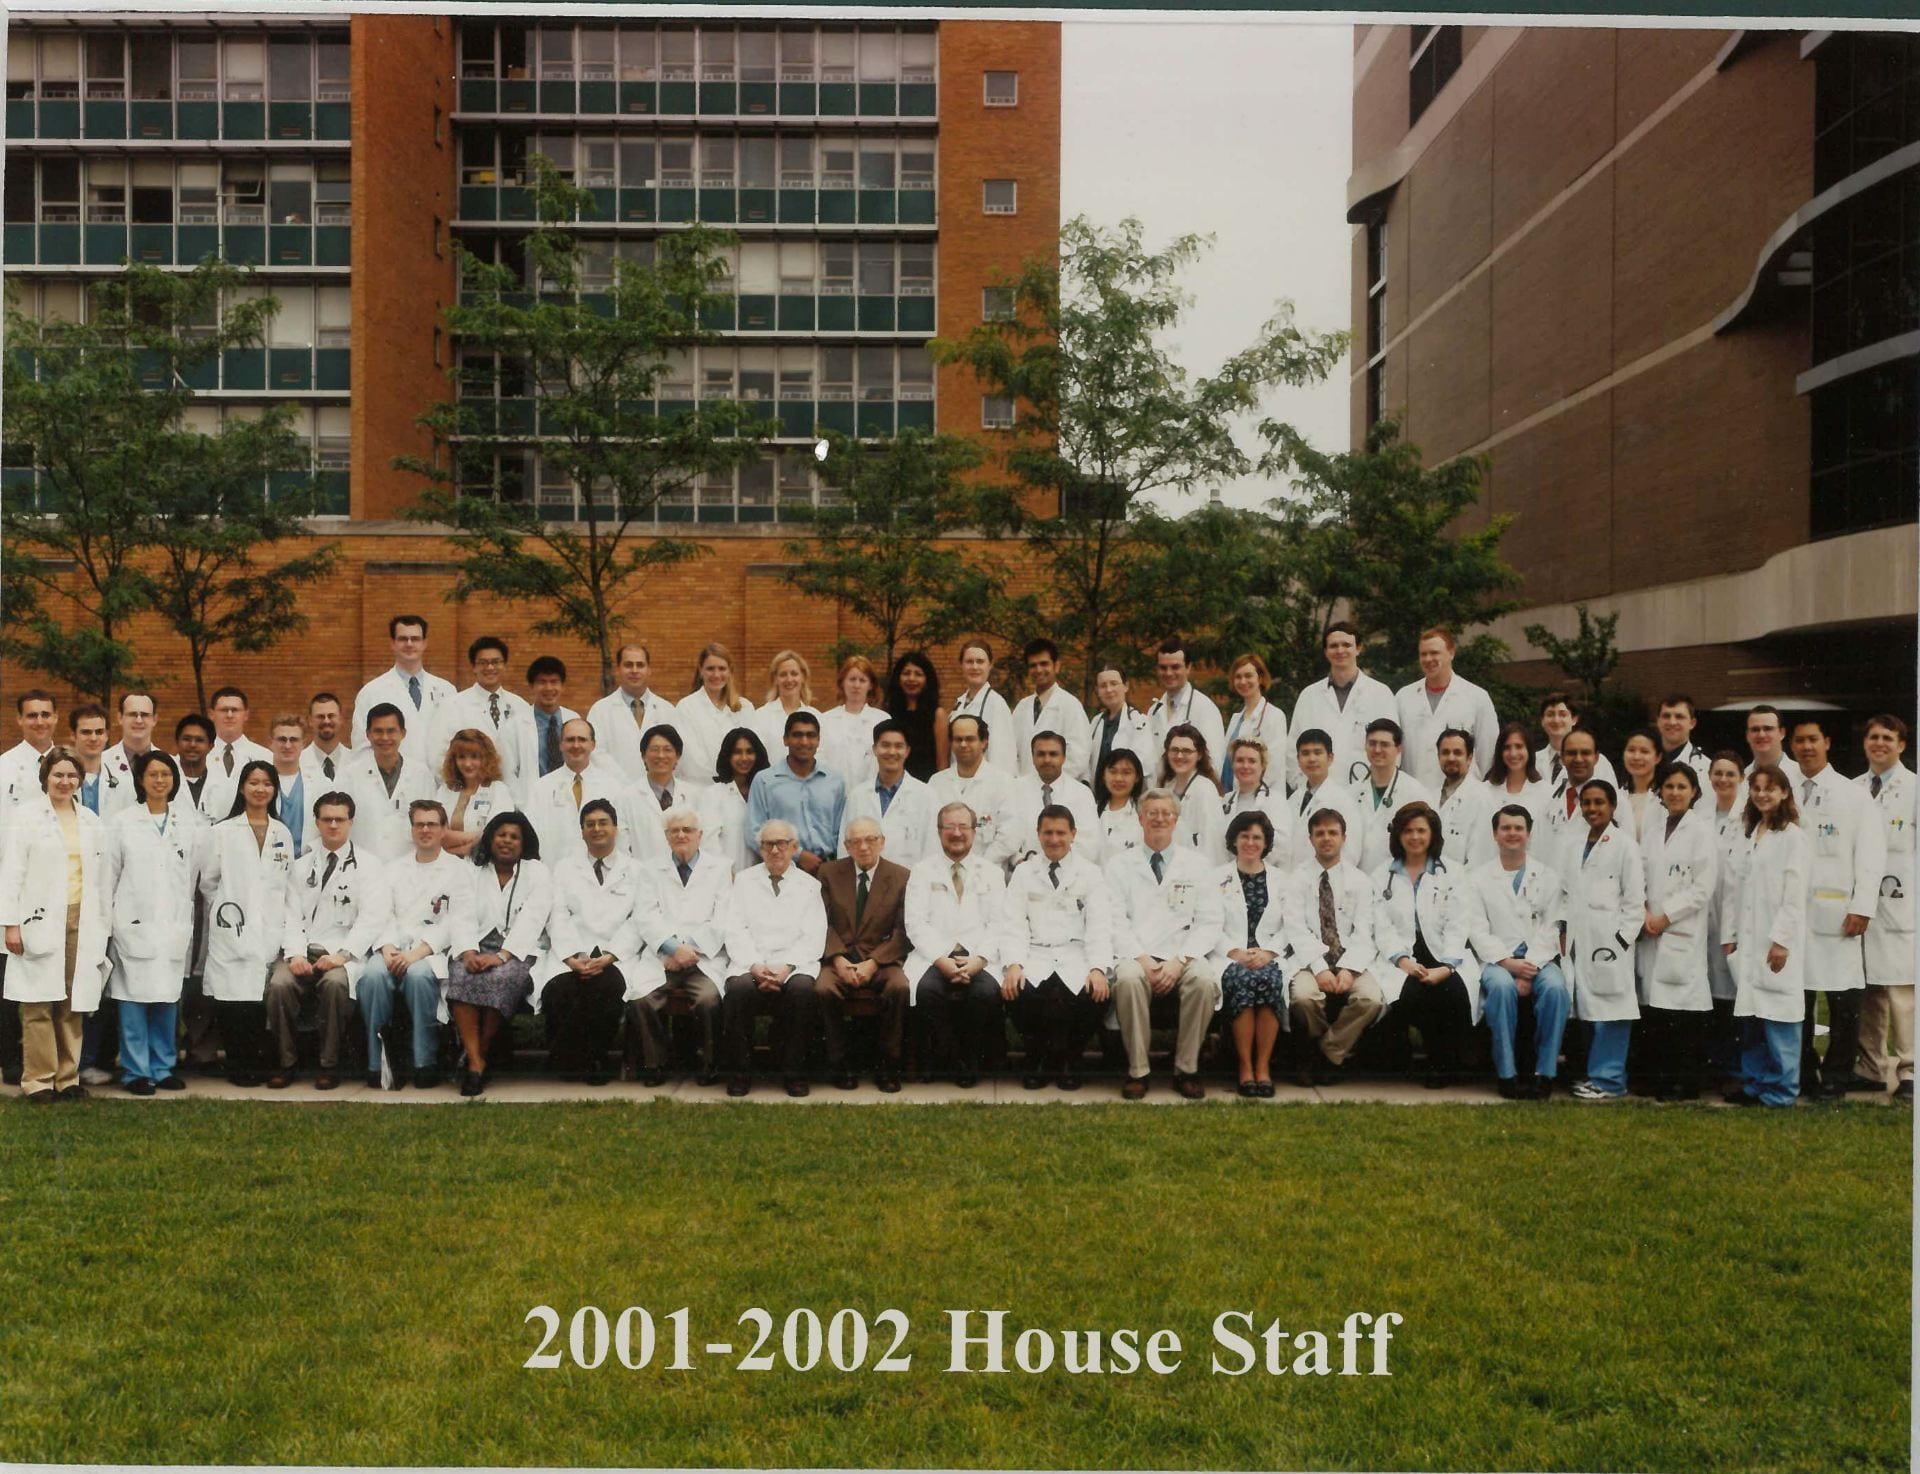 2001 Housestaff Photo